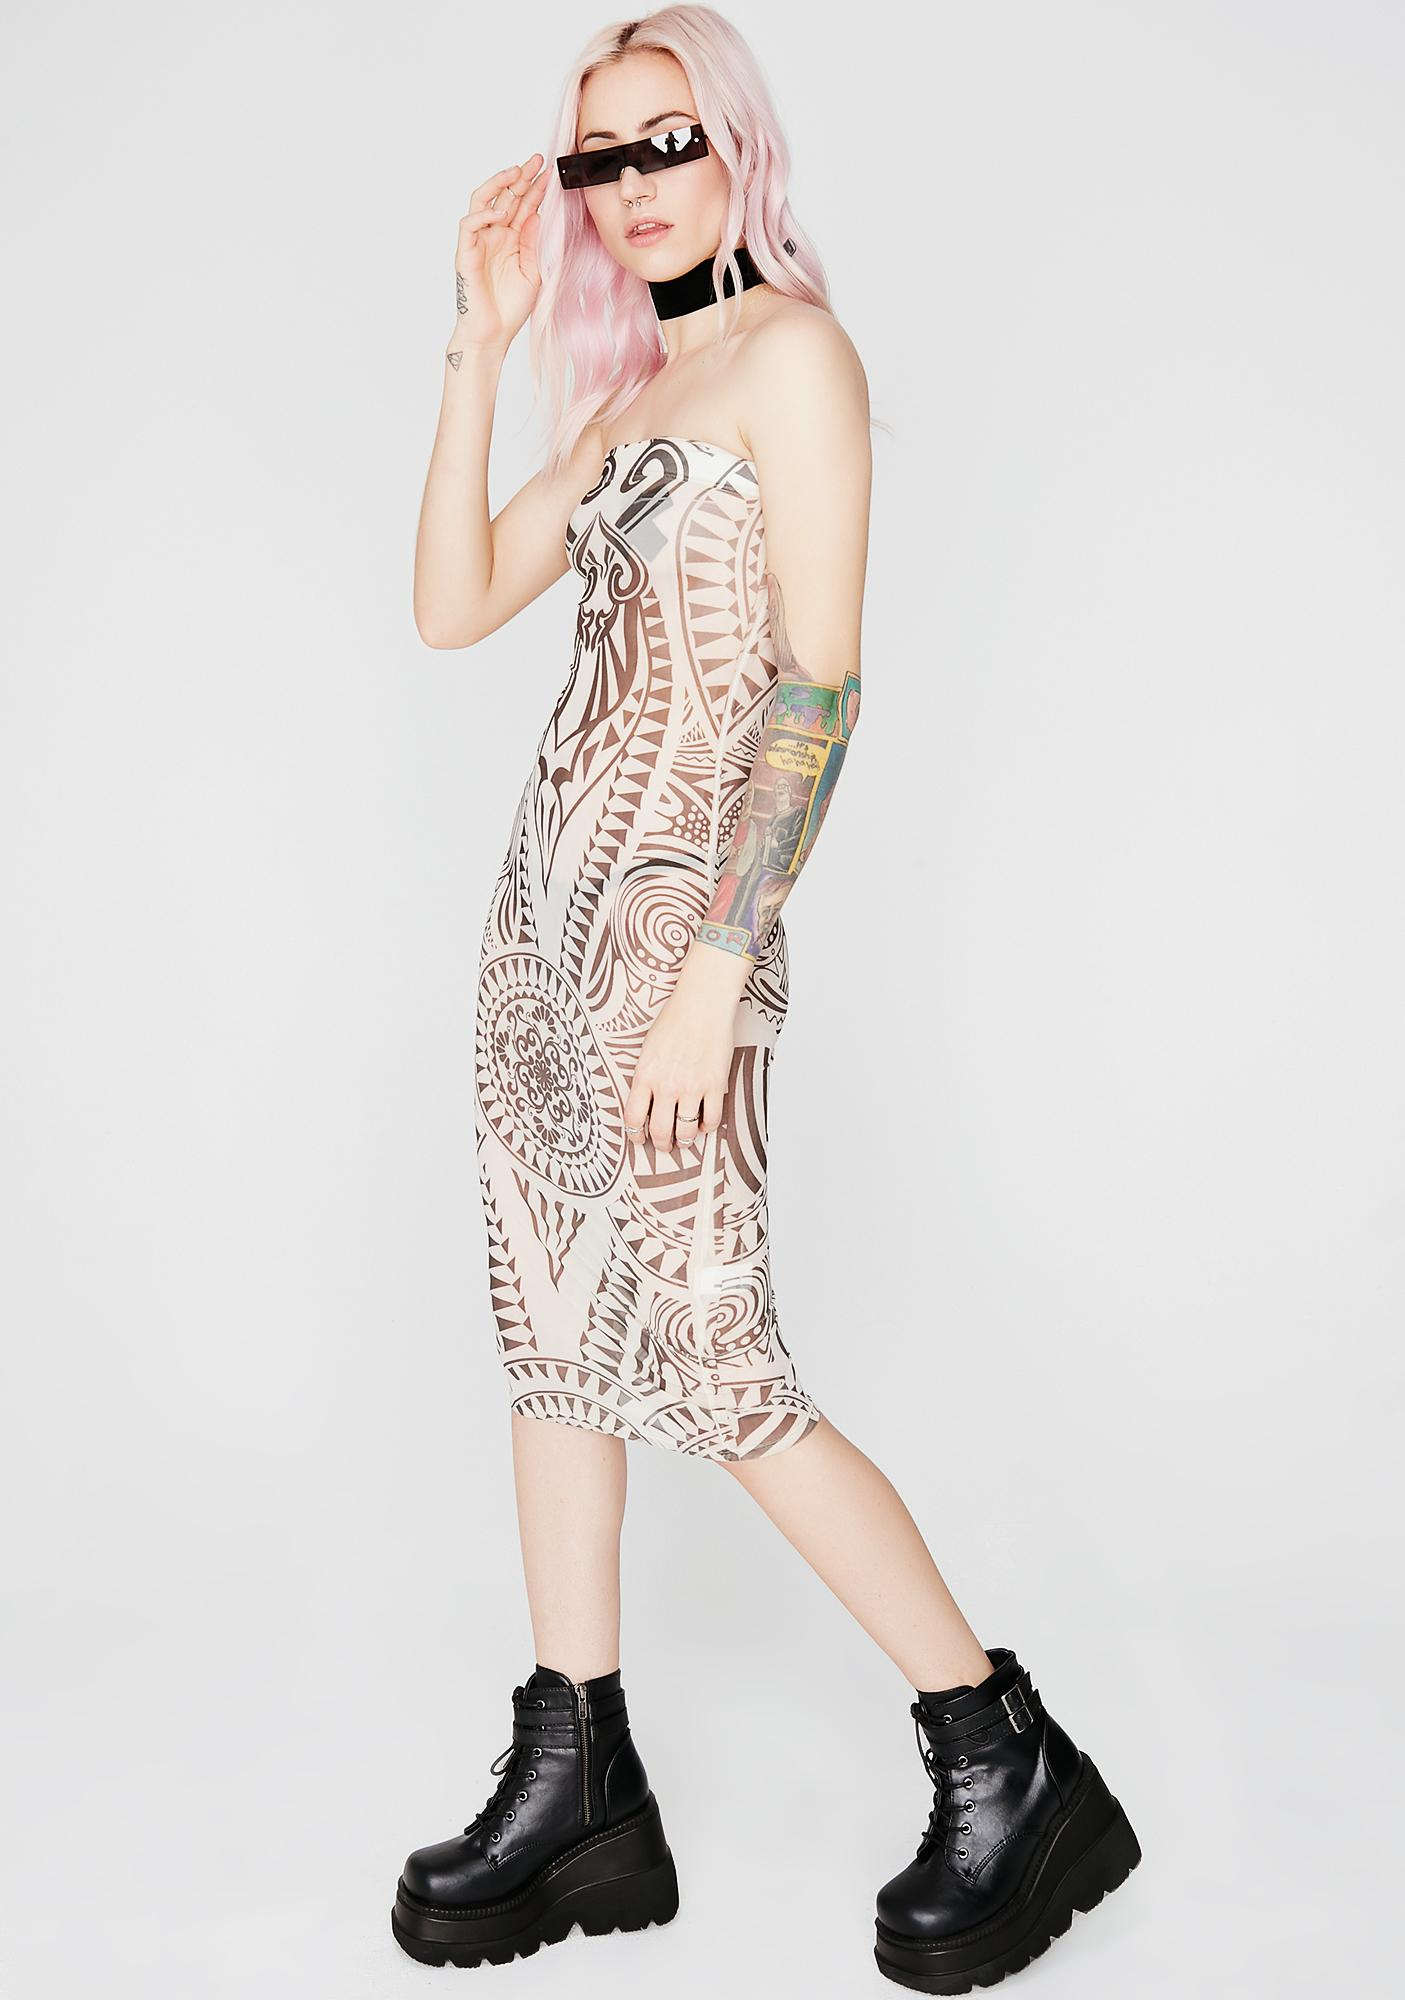 Perfect Illusion Strapless Dress